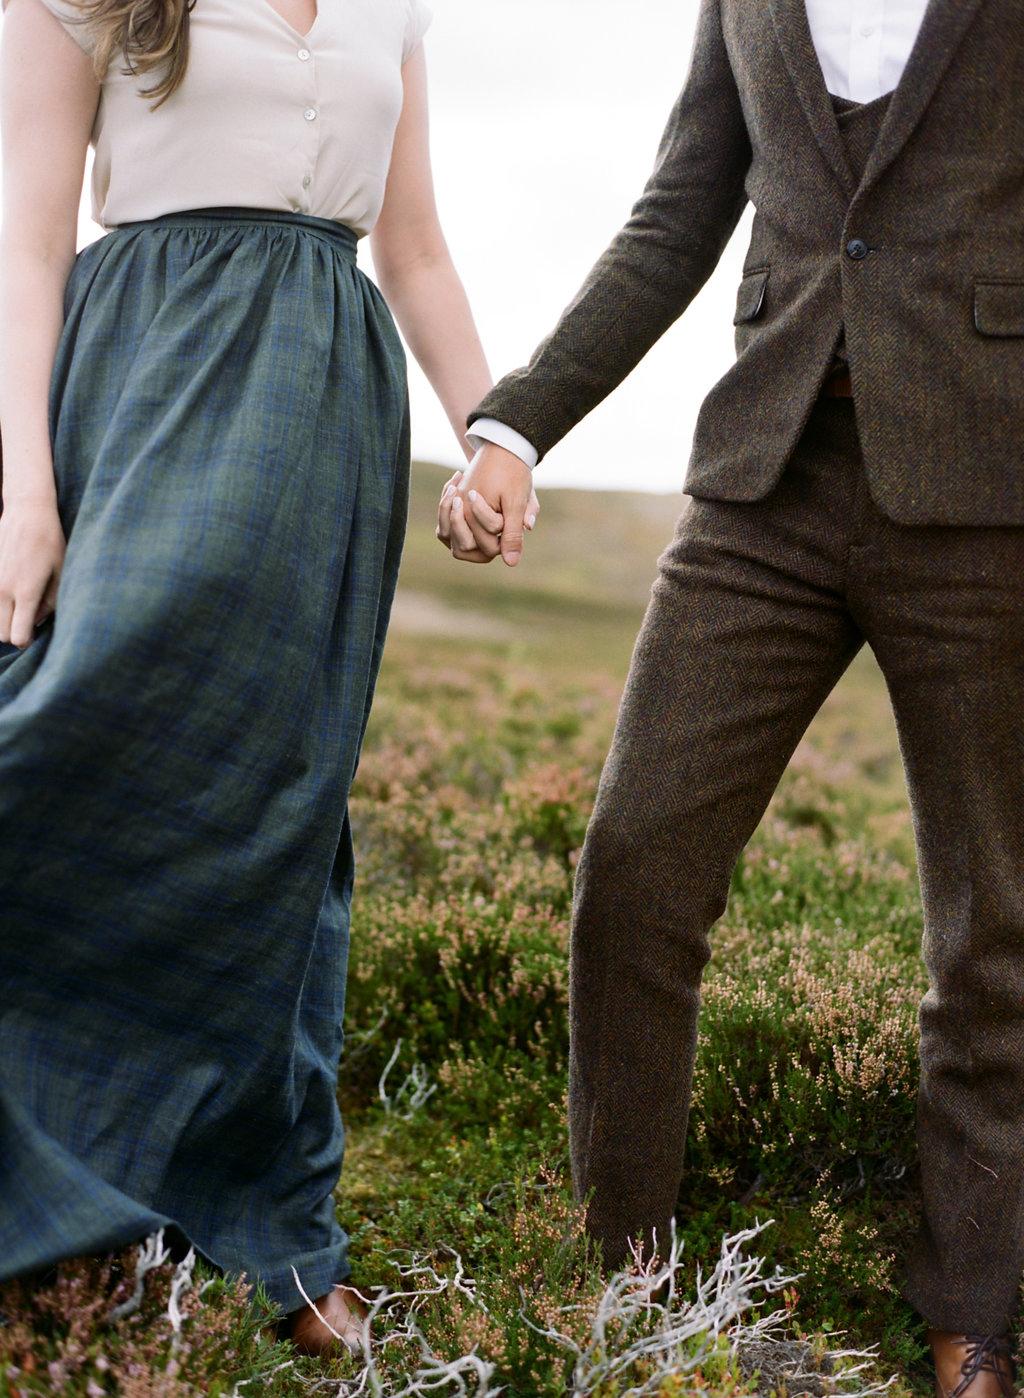 Scotland-Prewedding-highlands-castle-Engagment-Photos-Katie-Grant (79 of 139).jpg